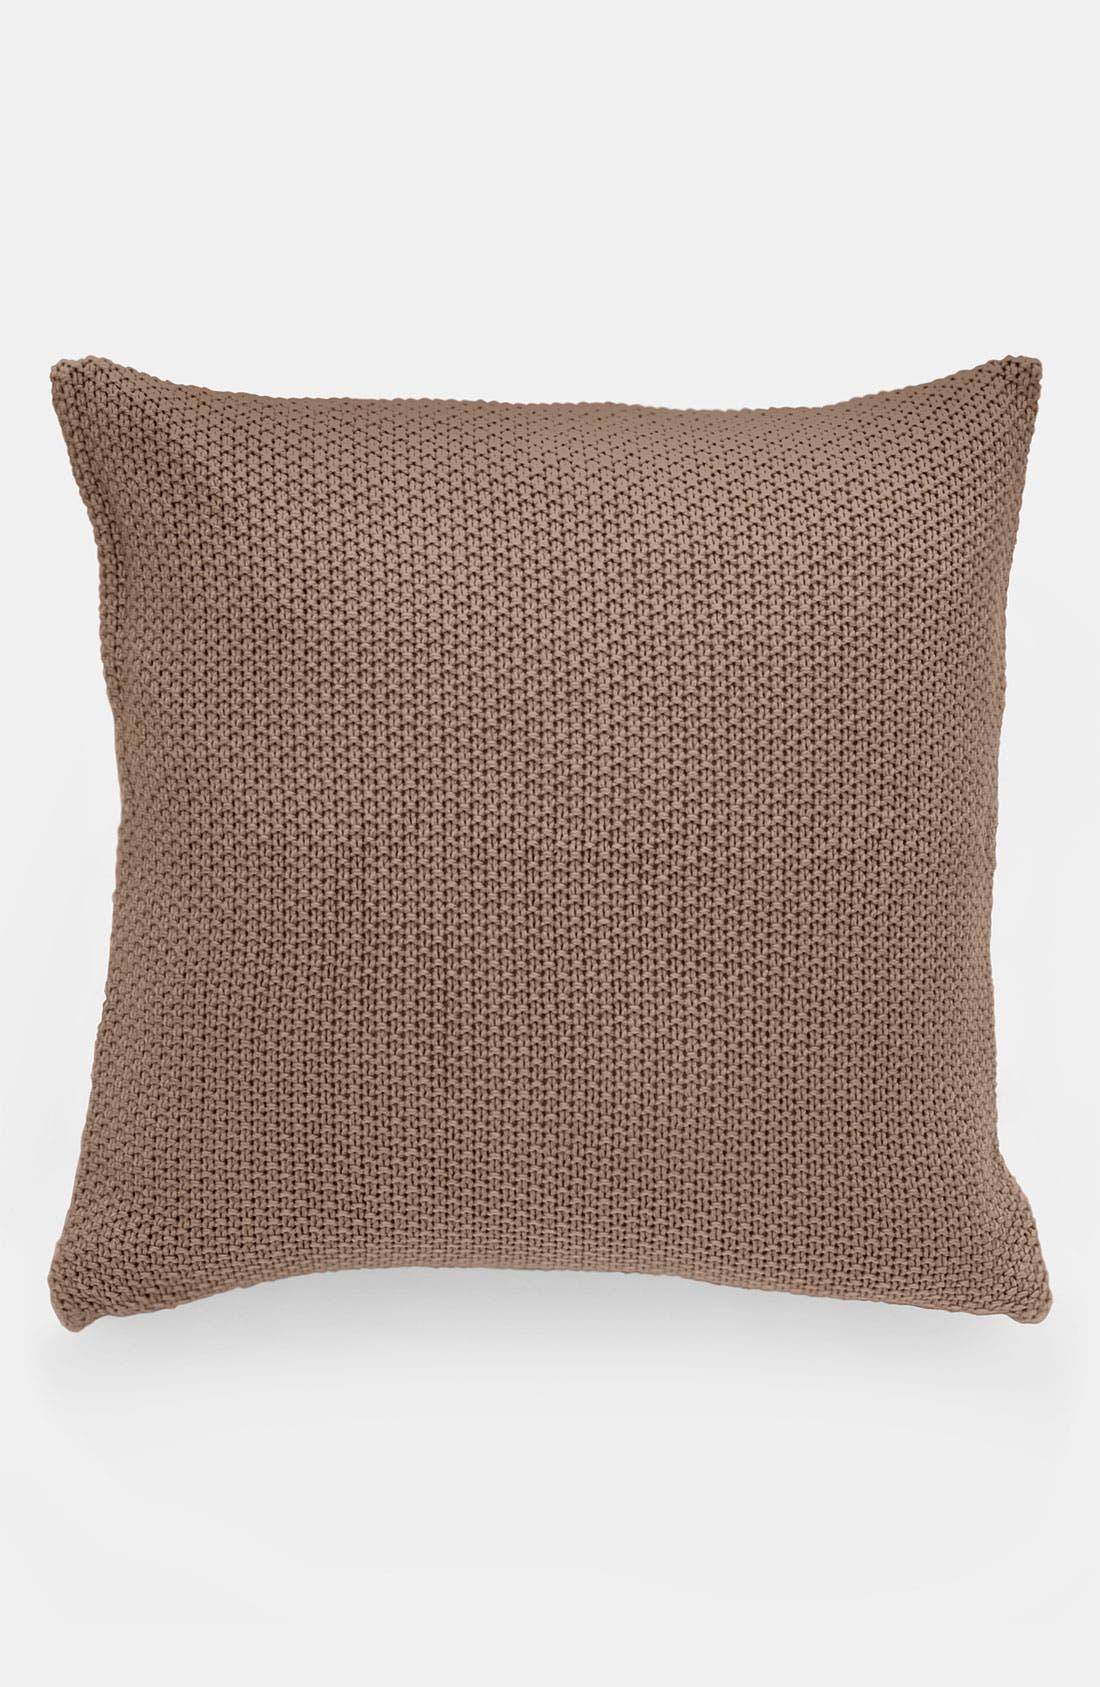 Main Image - Donna Karan 'The Essential' Euro Pillow Sham